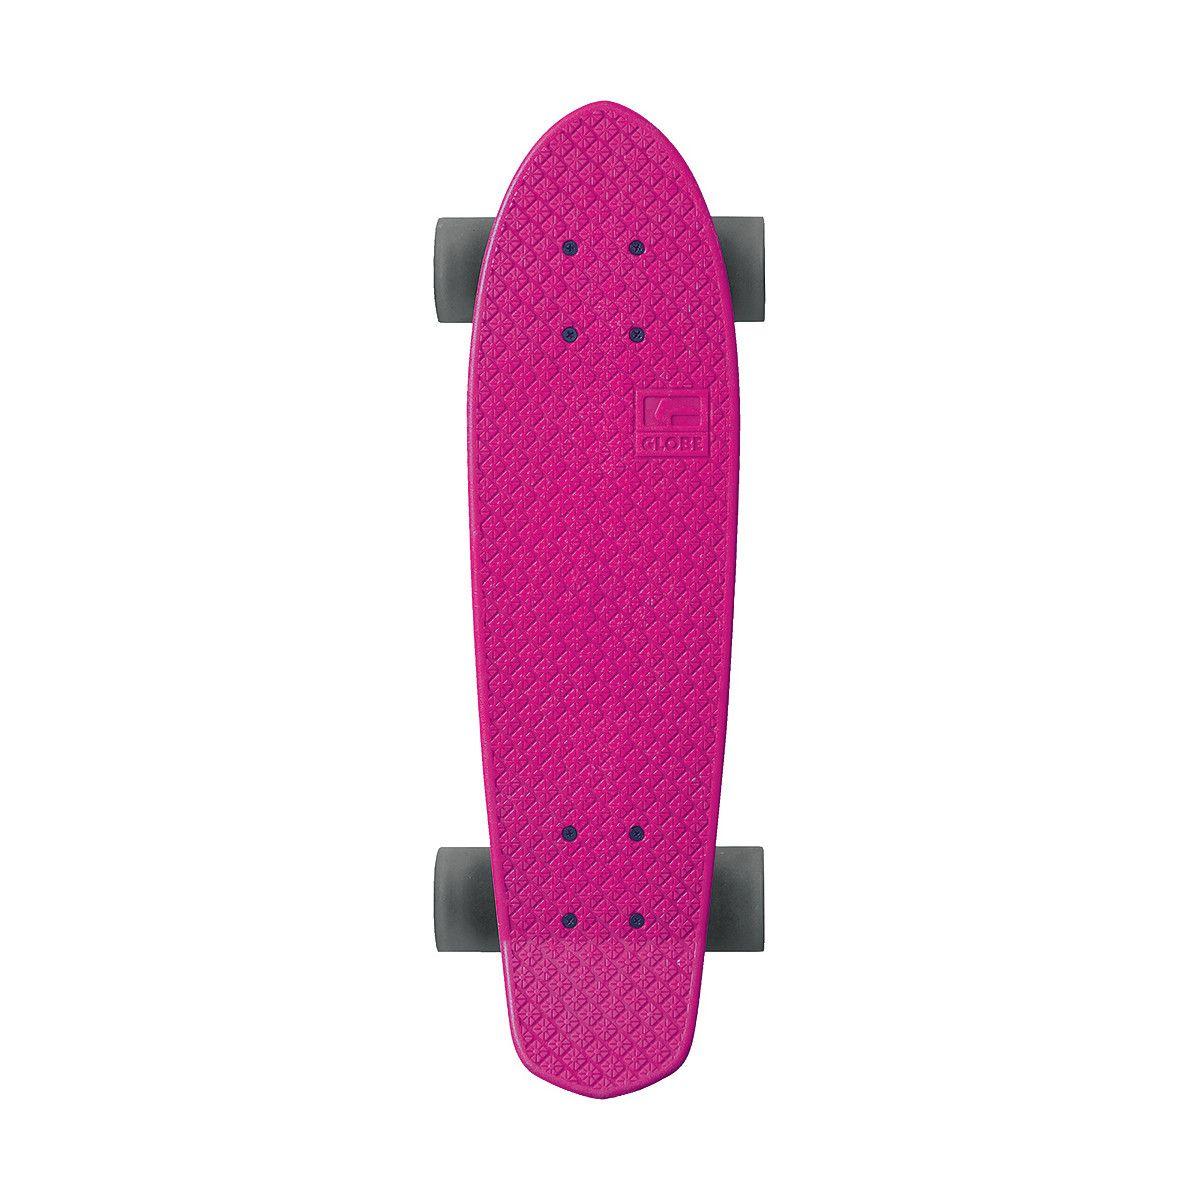 Penny board | Pink, Retro, Designer childrens clothes